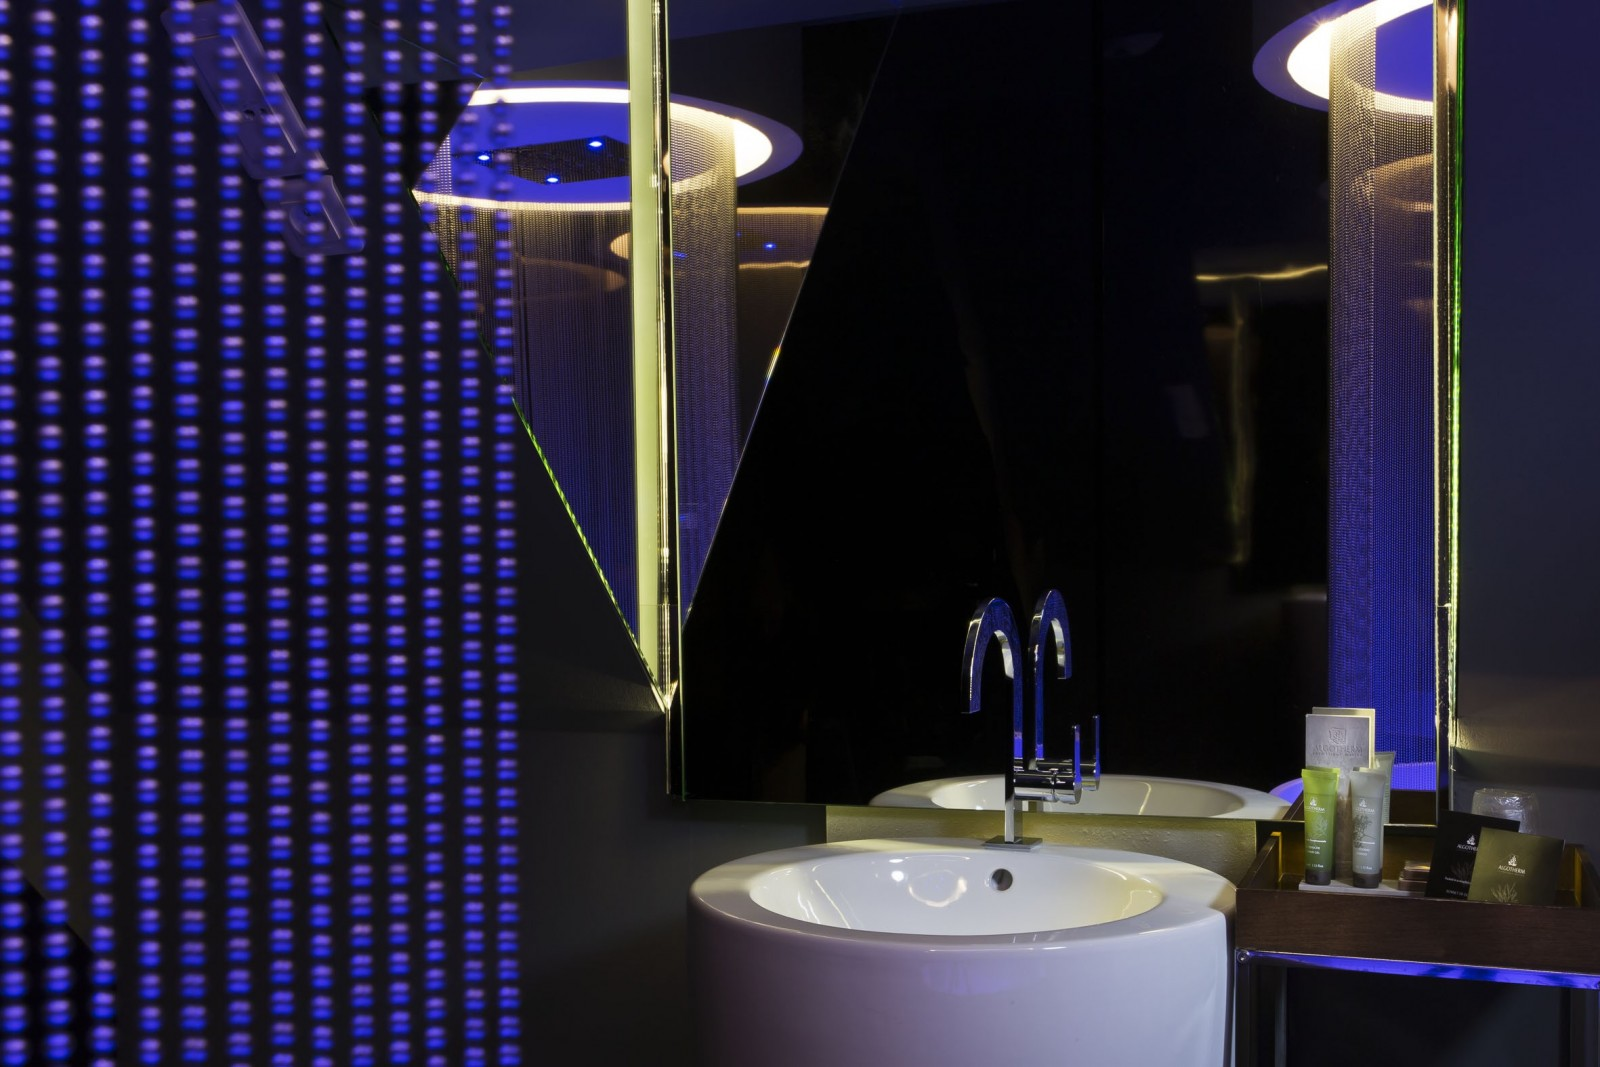 angely hotel paris chambers modernes le meilleur boutique hotel. Black Bedroom Furniture Sets. Home Design Ideas